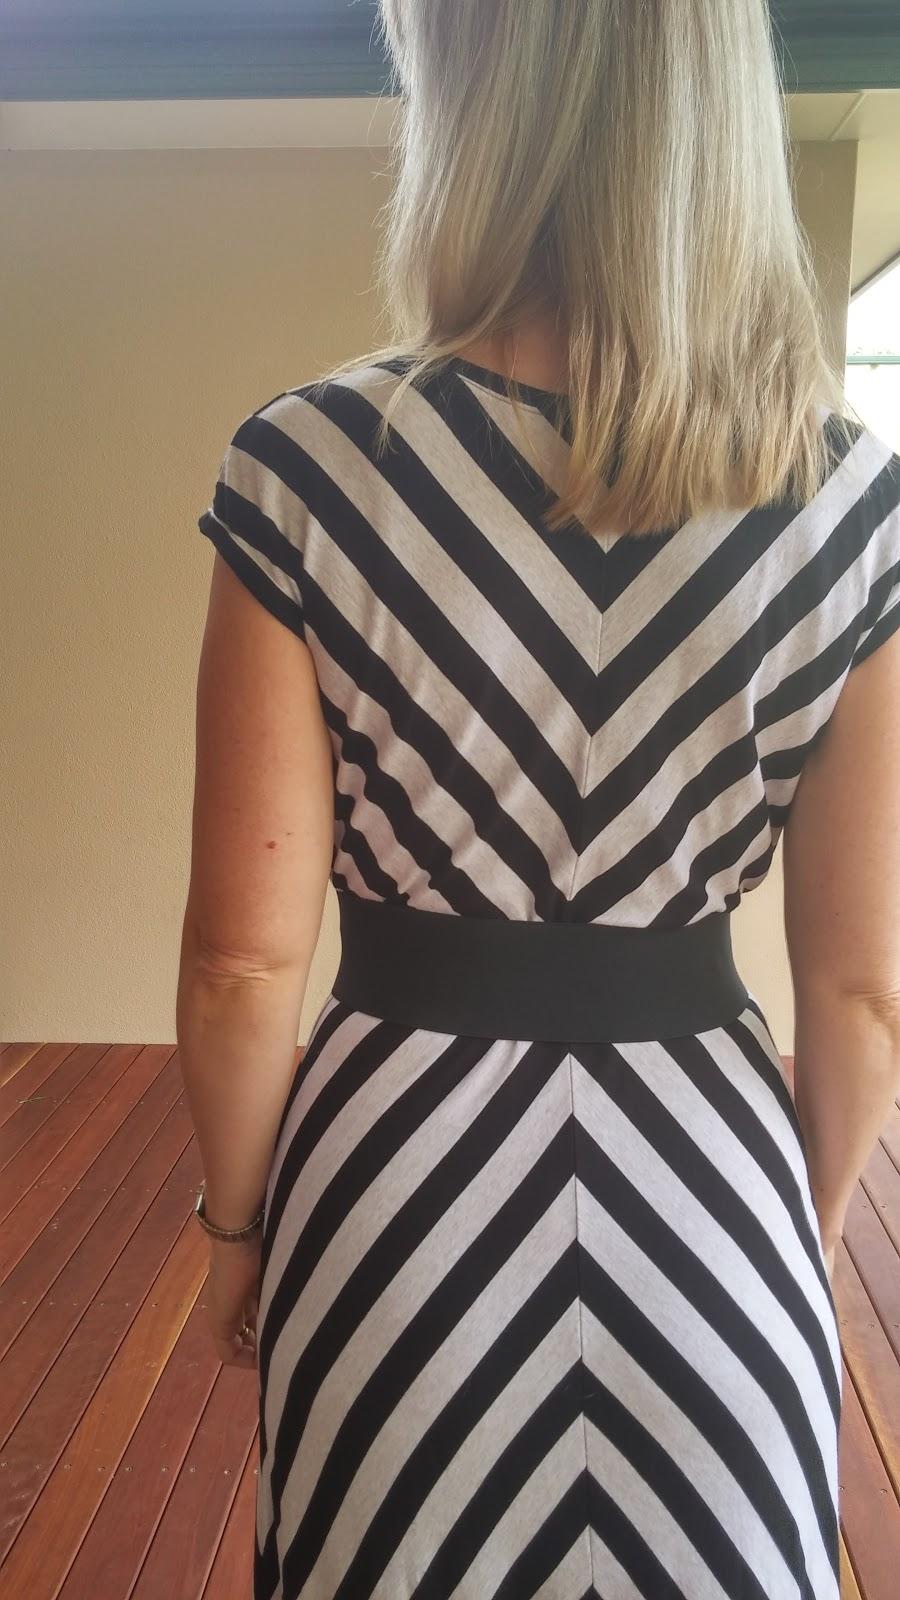 Vogue 1027 quarter circle skirt modification back view